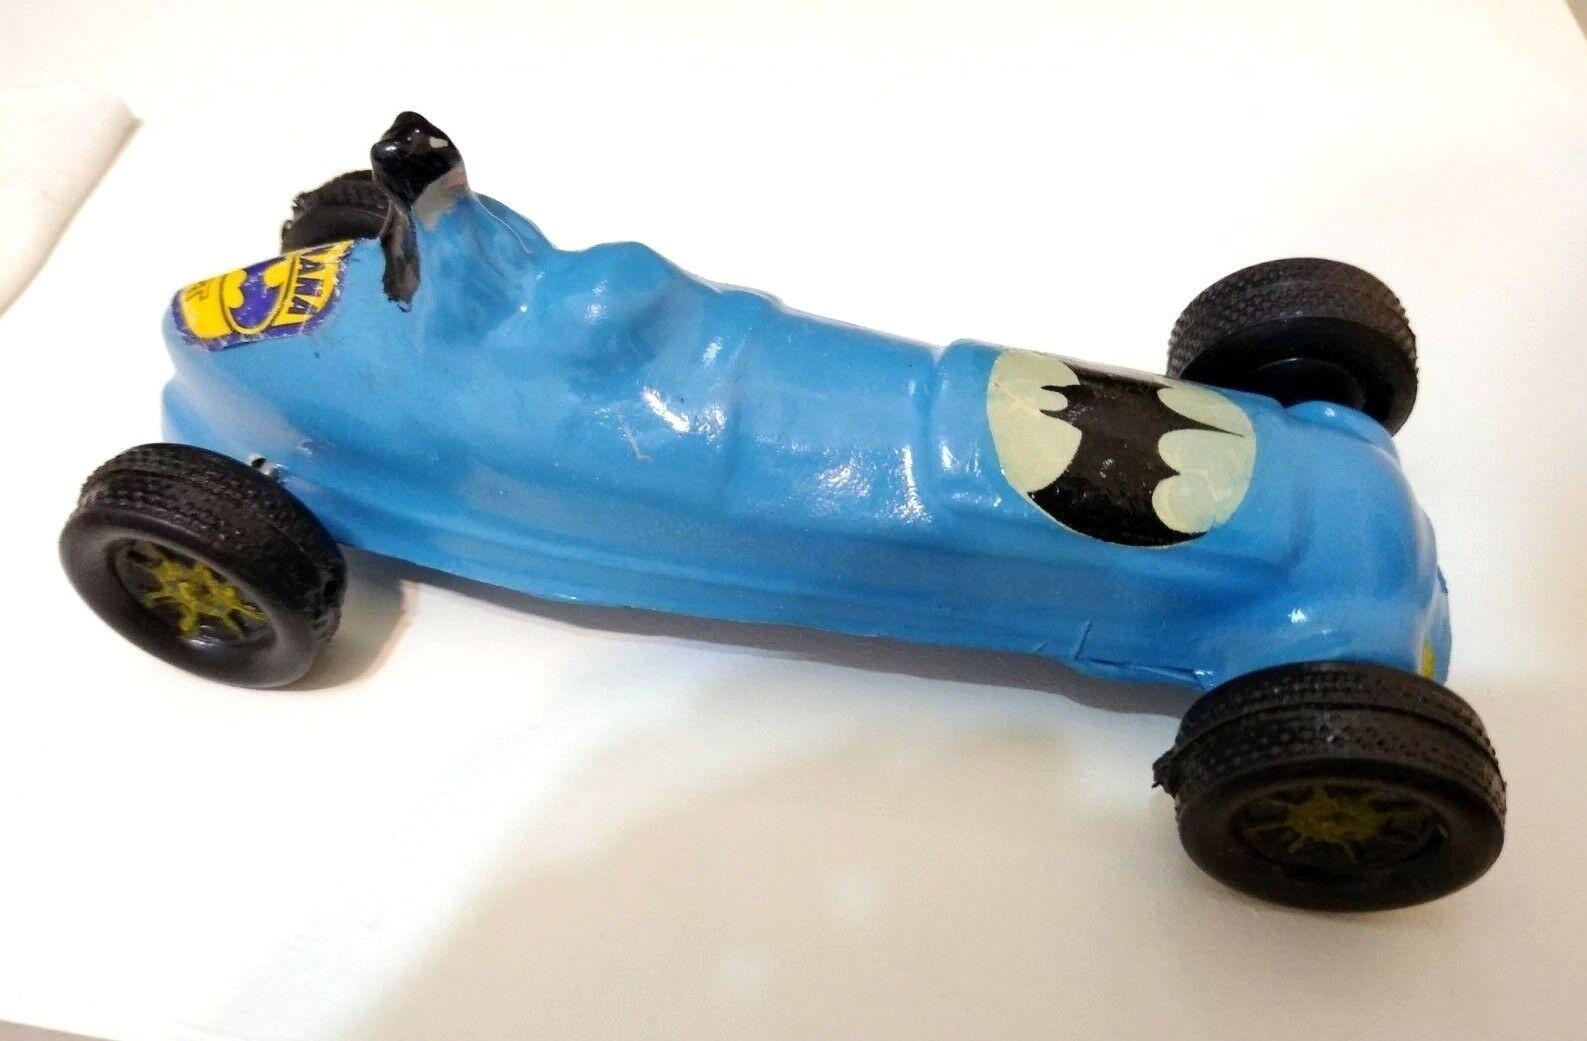 BATMAN BATMOBILE 1966 TV SHOW LIGHT blueE BOOTLEG CAR  BATNANA  silverINA RARE